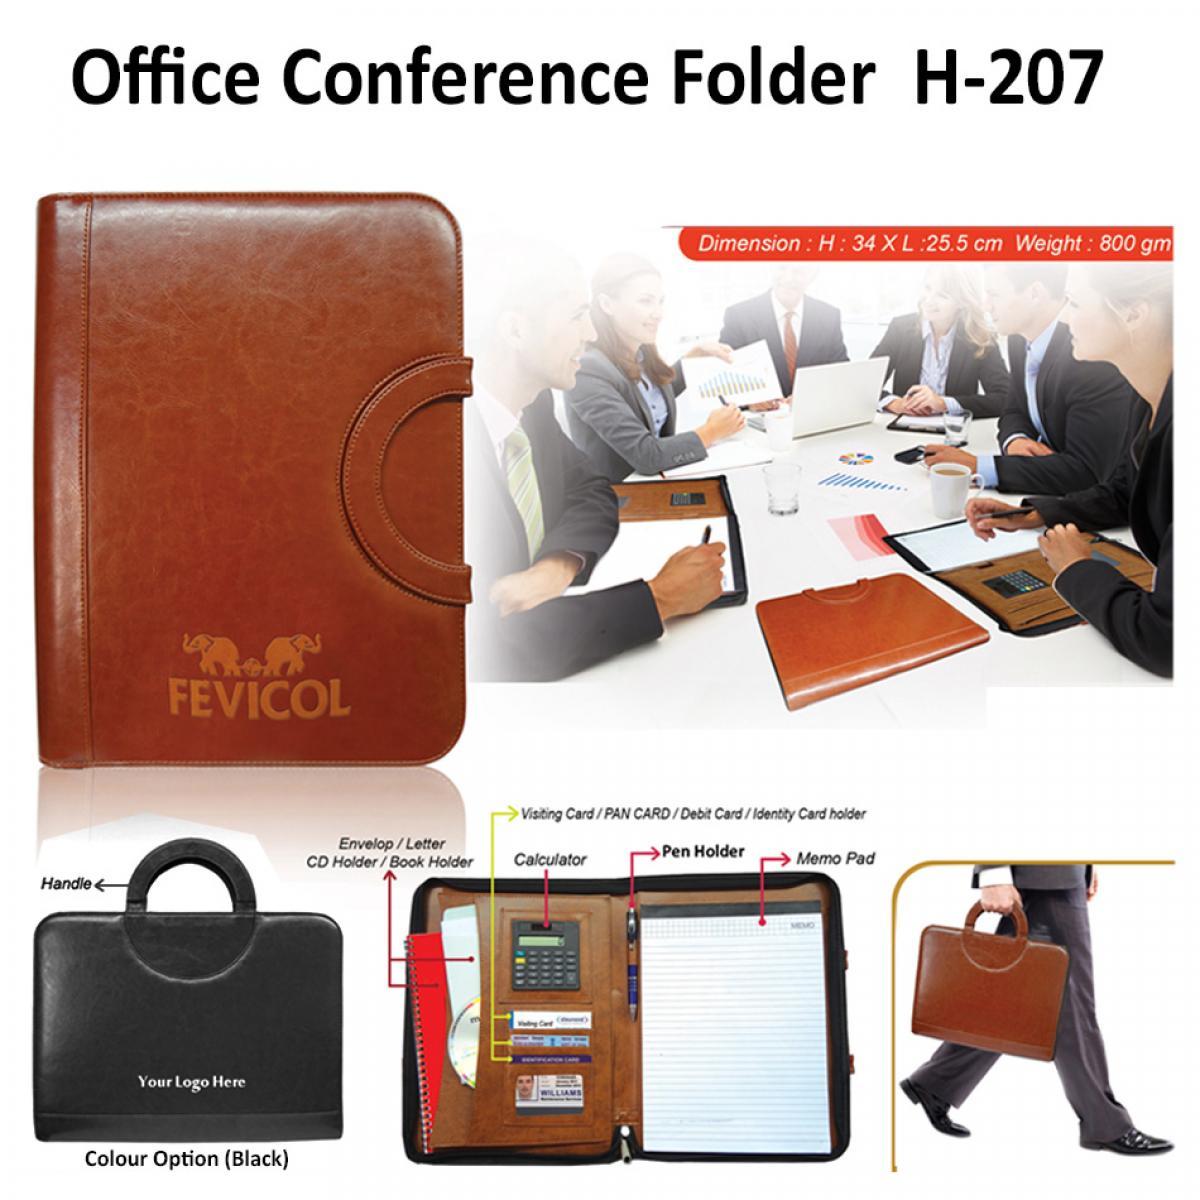 Office Conference Folder